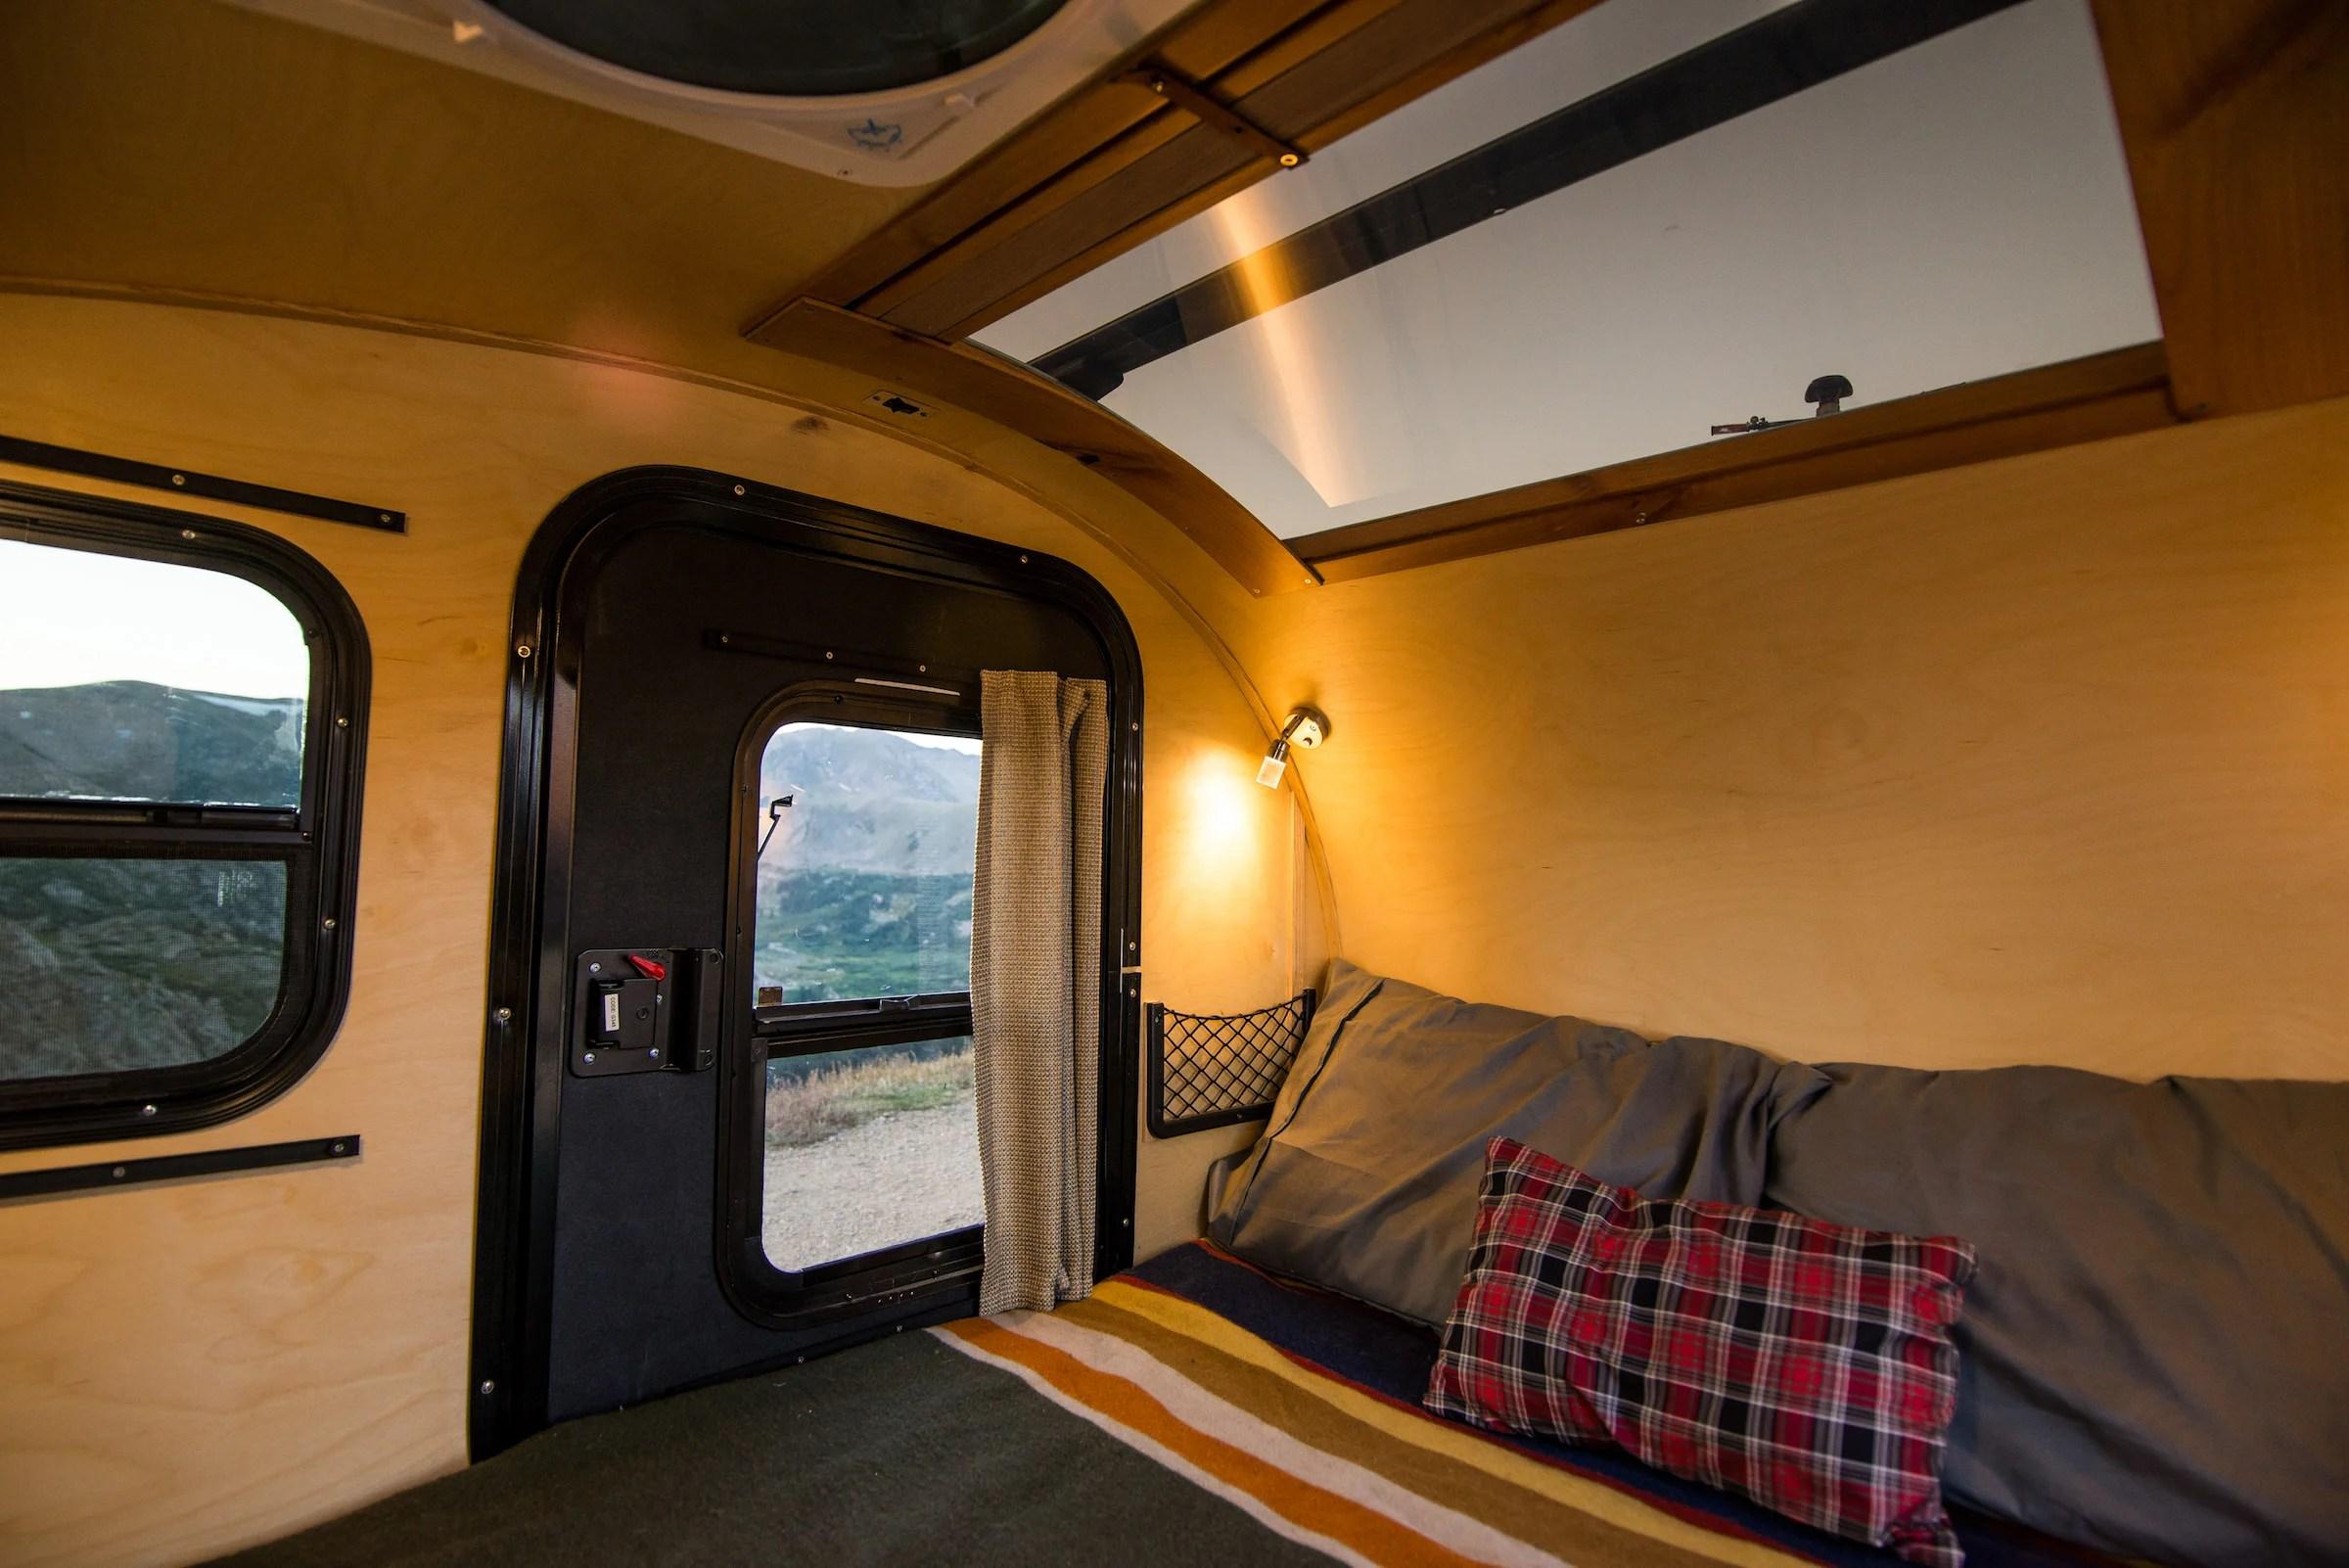 kitchen cabinets ebay cabinet drawers timberleaf pika teardrop camper trailer - $11,750 usd